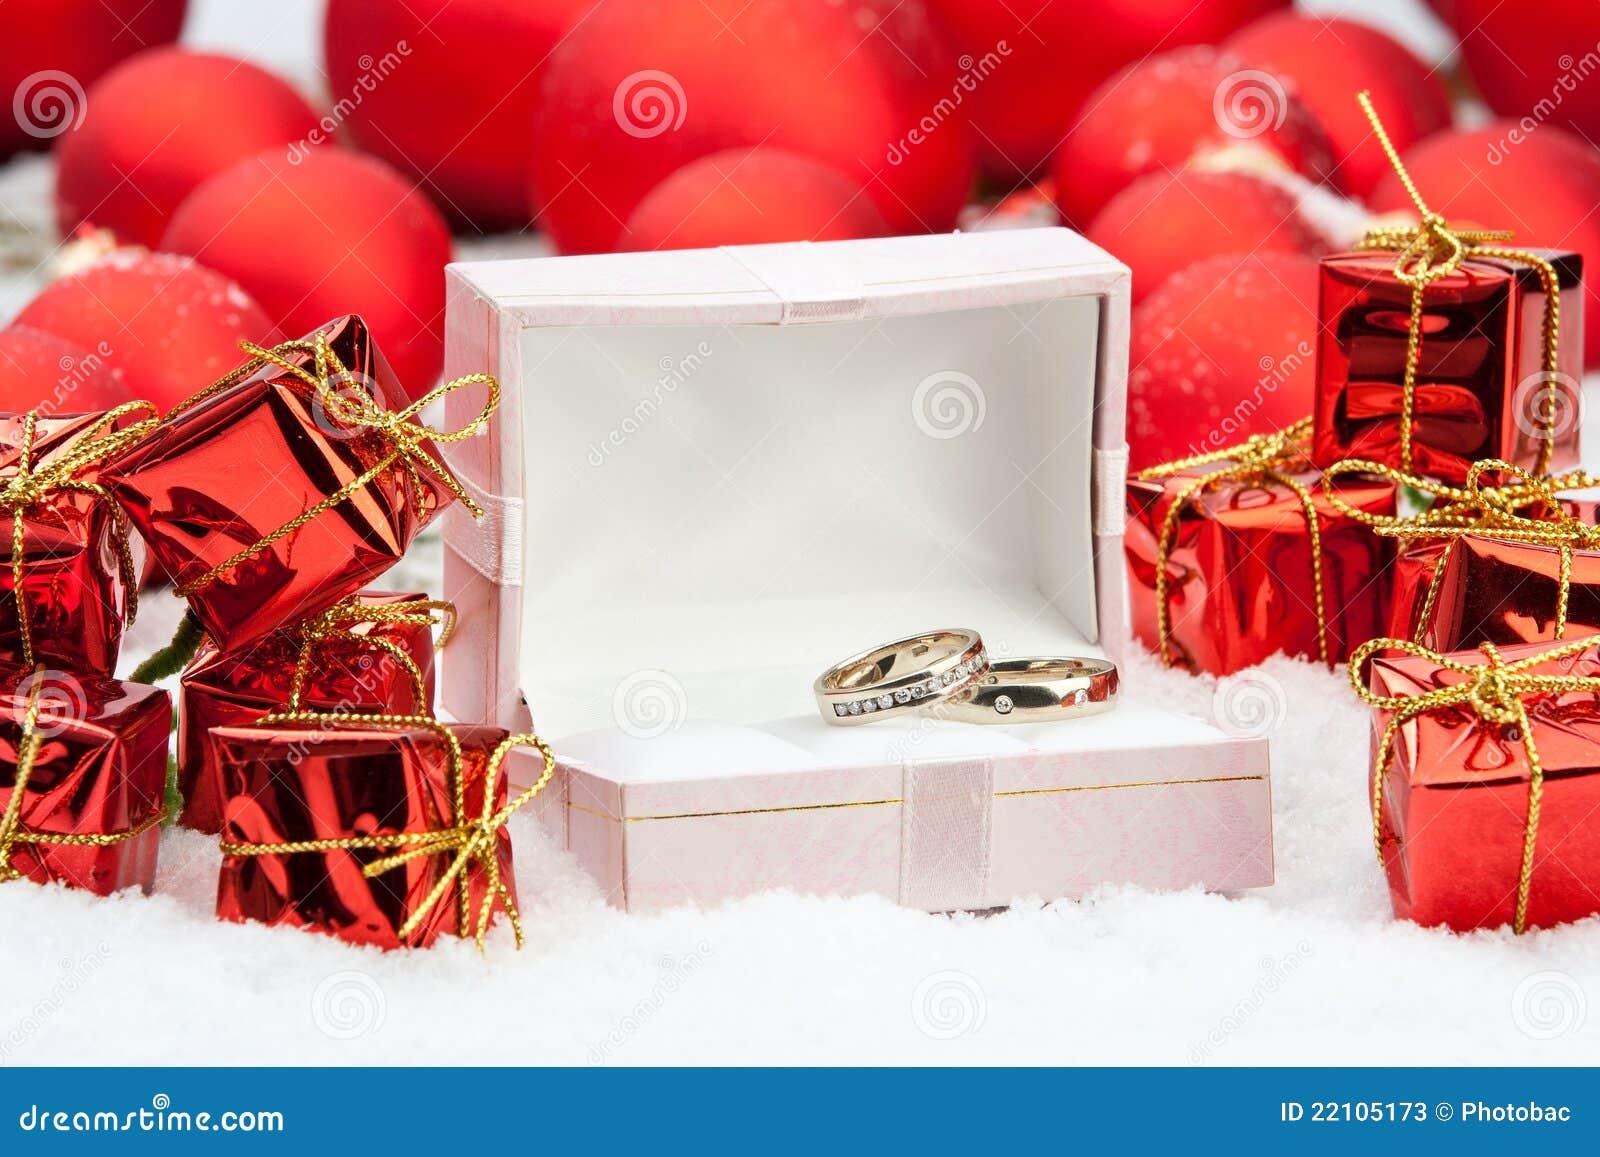 Wedding Rings Among Christmas Decorations Stock Photos